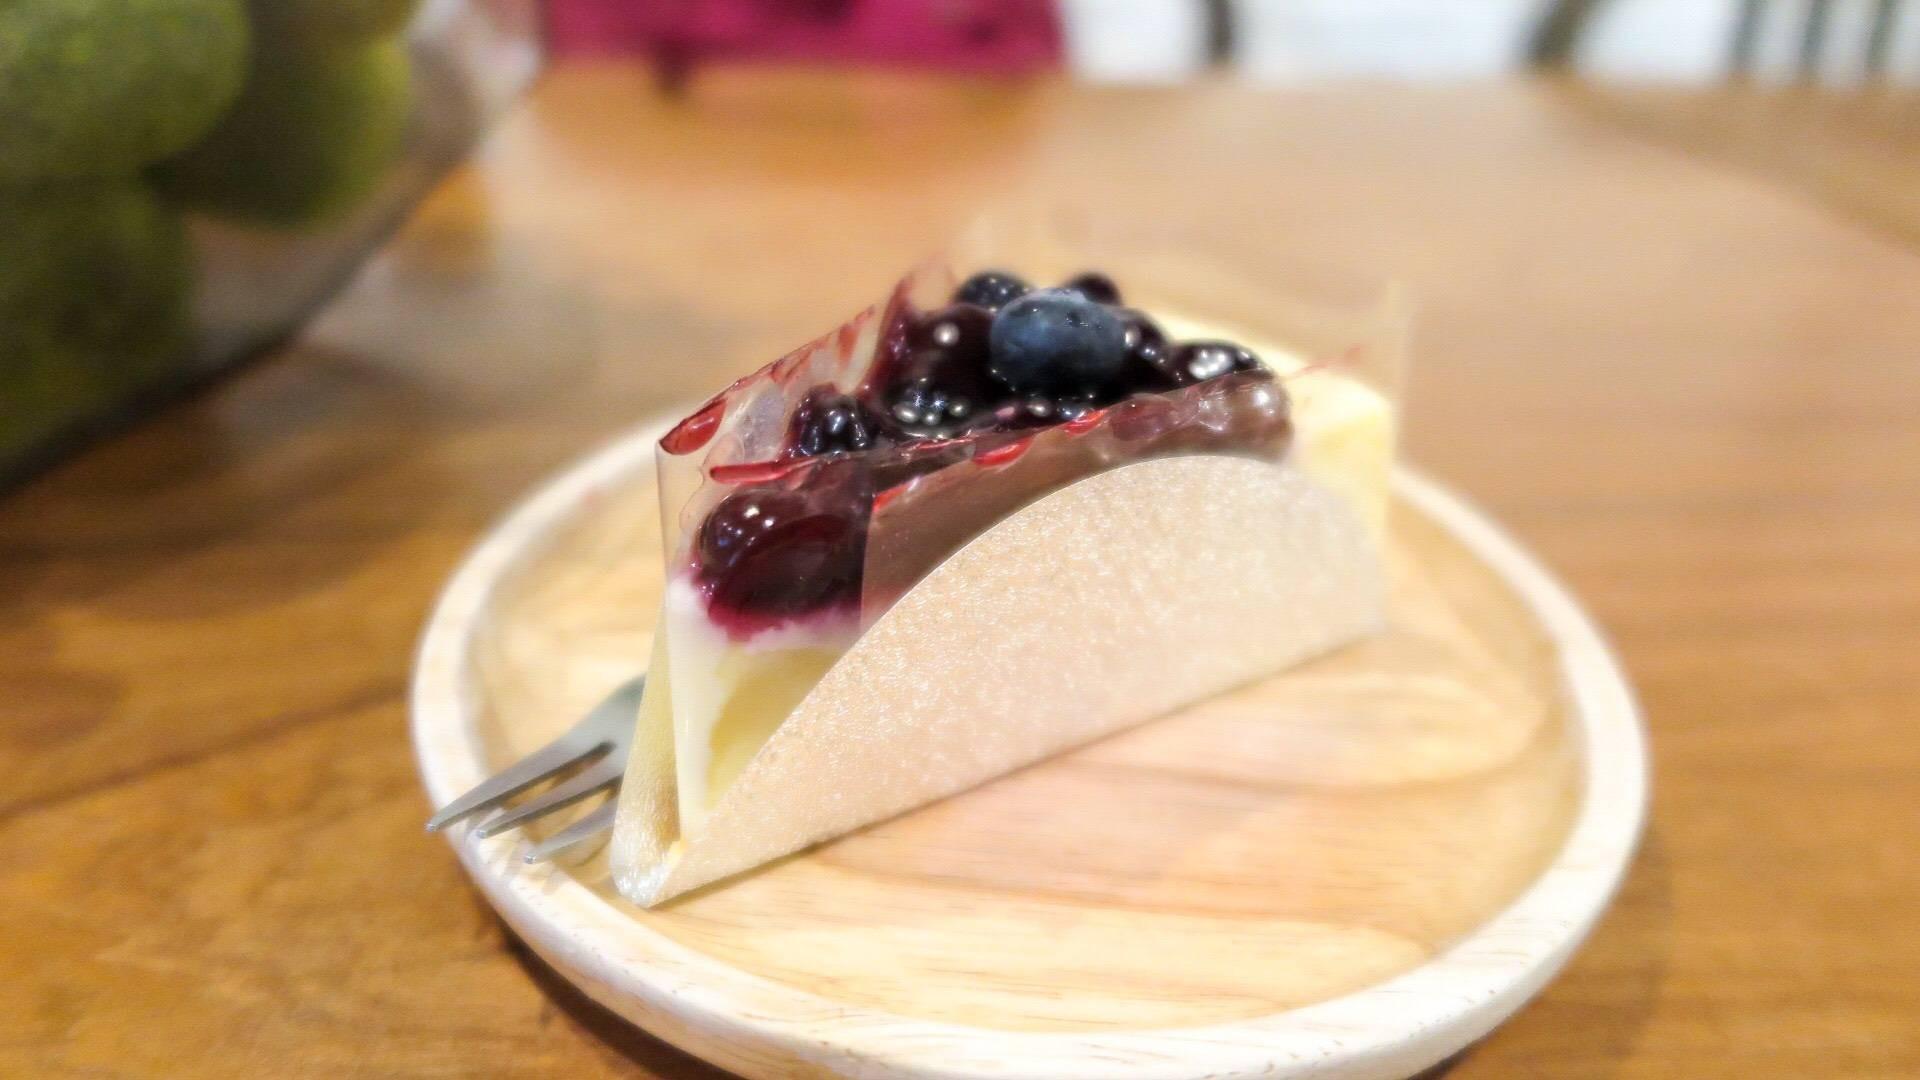 Blueberry Cheesecake (95THB)